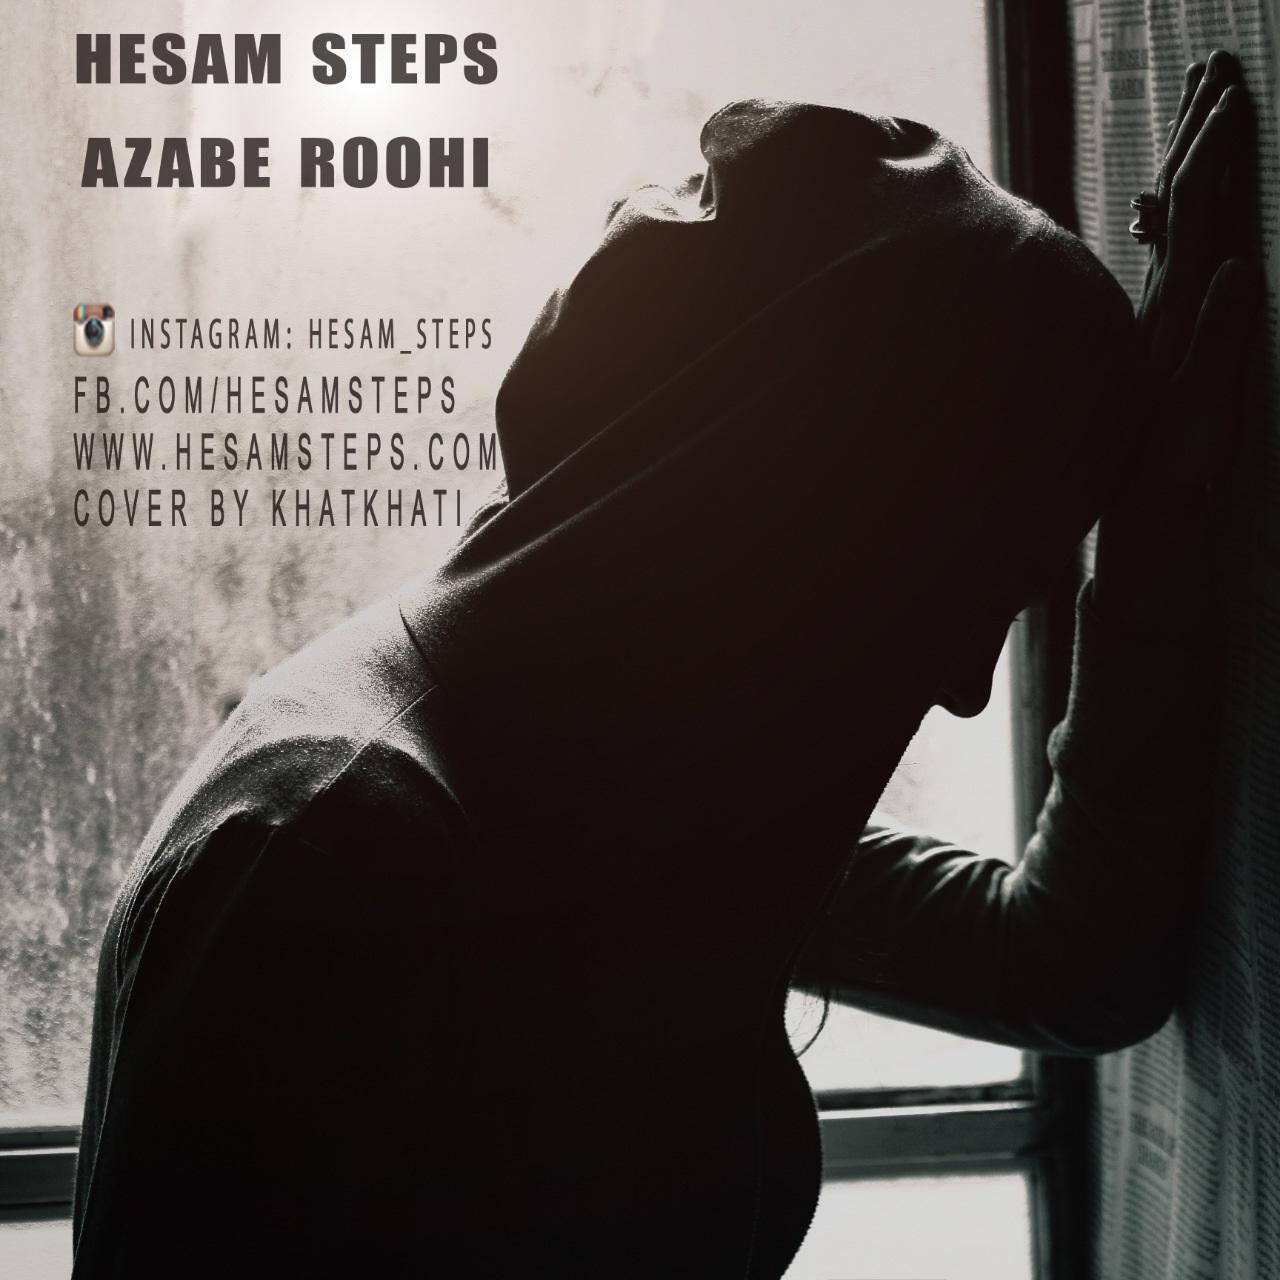 Hesam Steps – Azabe Roohi